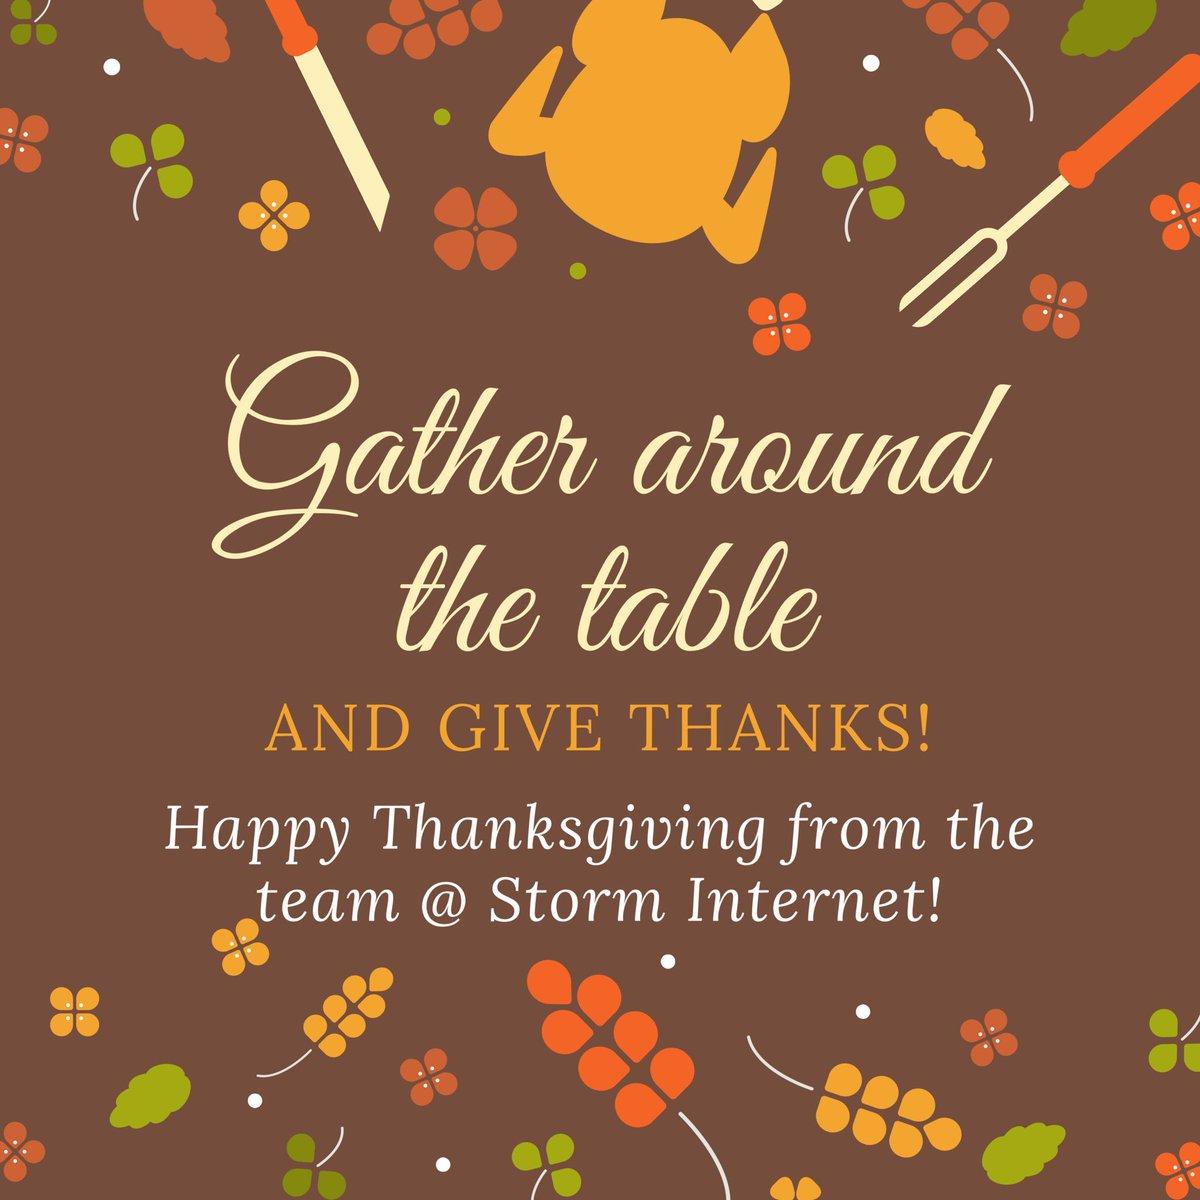 Happy Thanksgiving! Enjoy the long weeke...